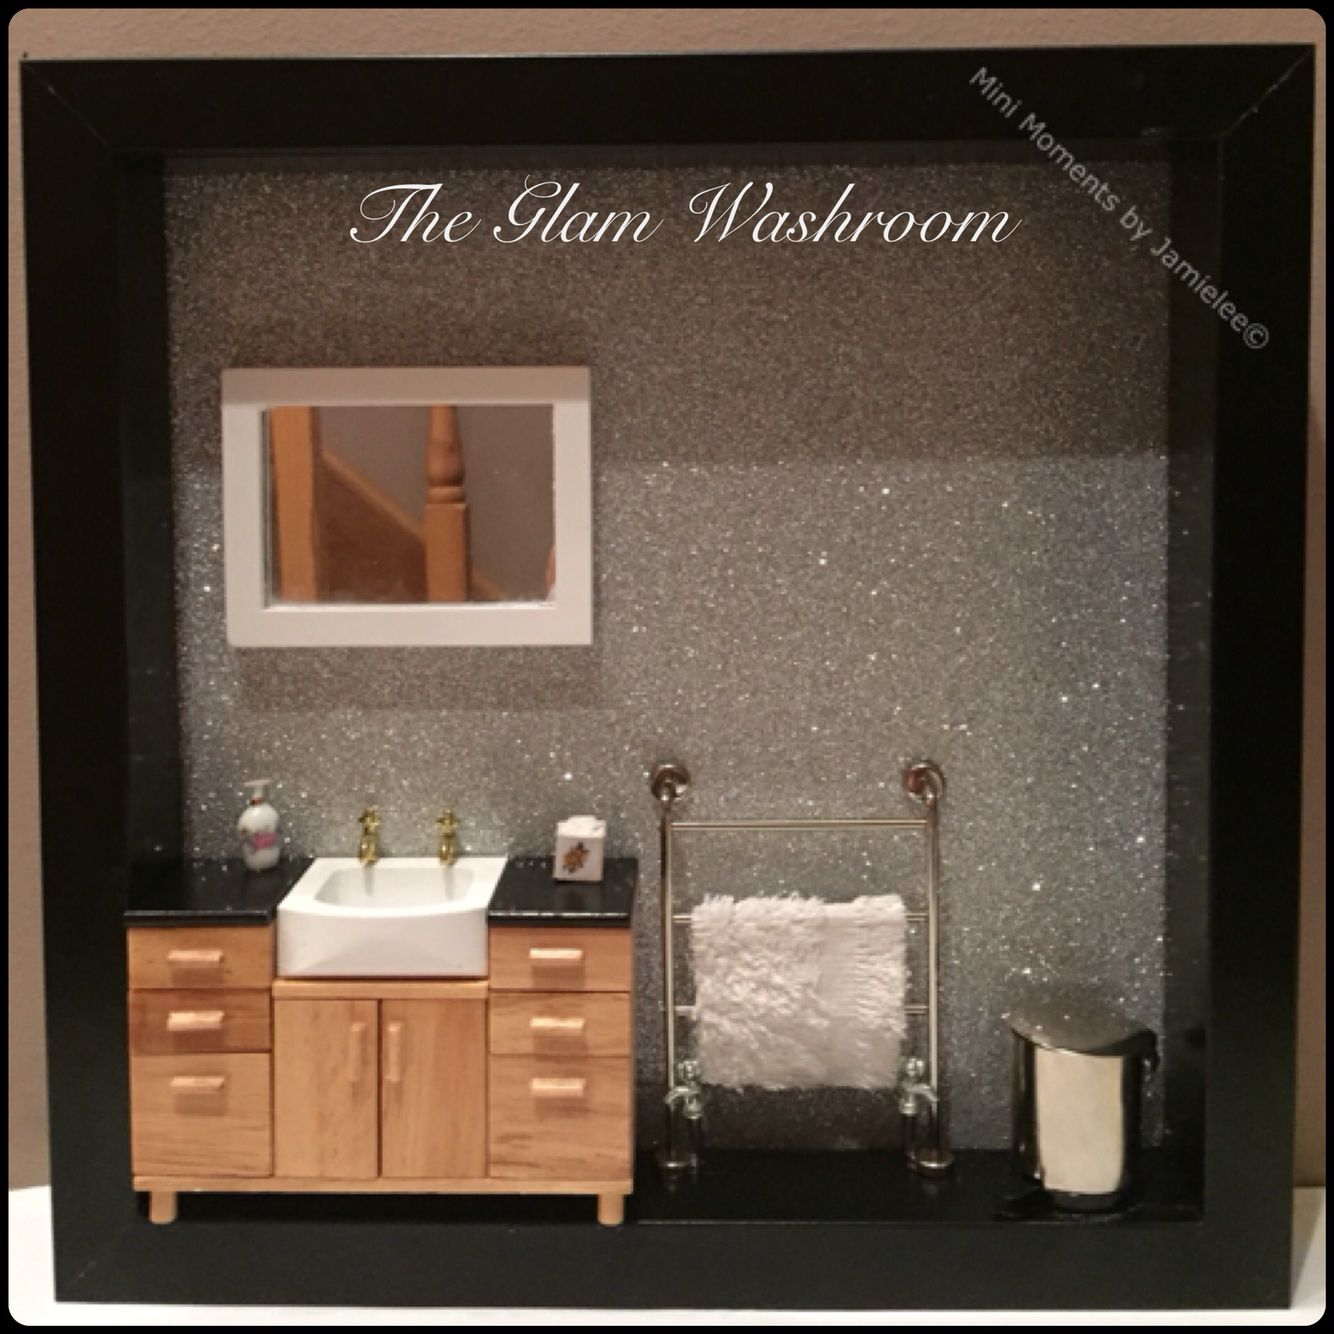 The glam washroom Mini Box frame a tiny sink unit, towel rail, pedal bin mirror and glitter wall paper :)  From mini moments by Jamielee www.fb.com/minimomentsbyjamielee